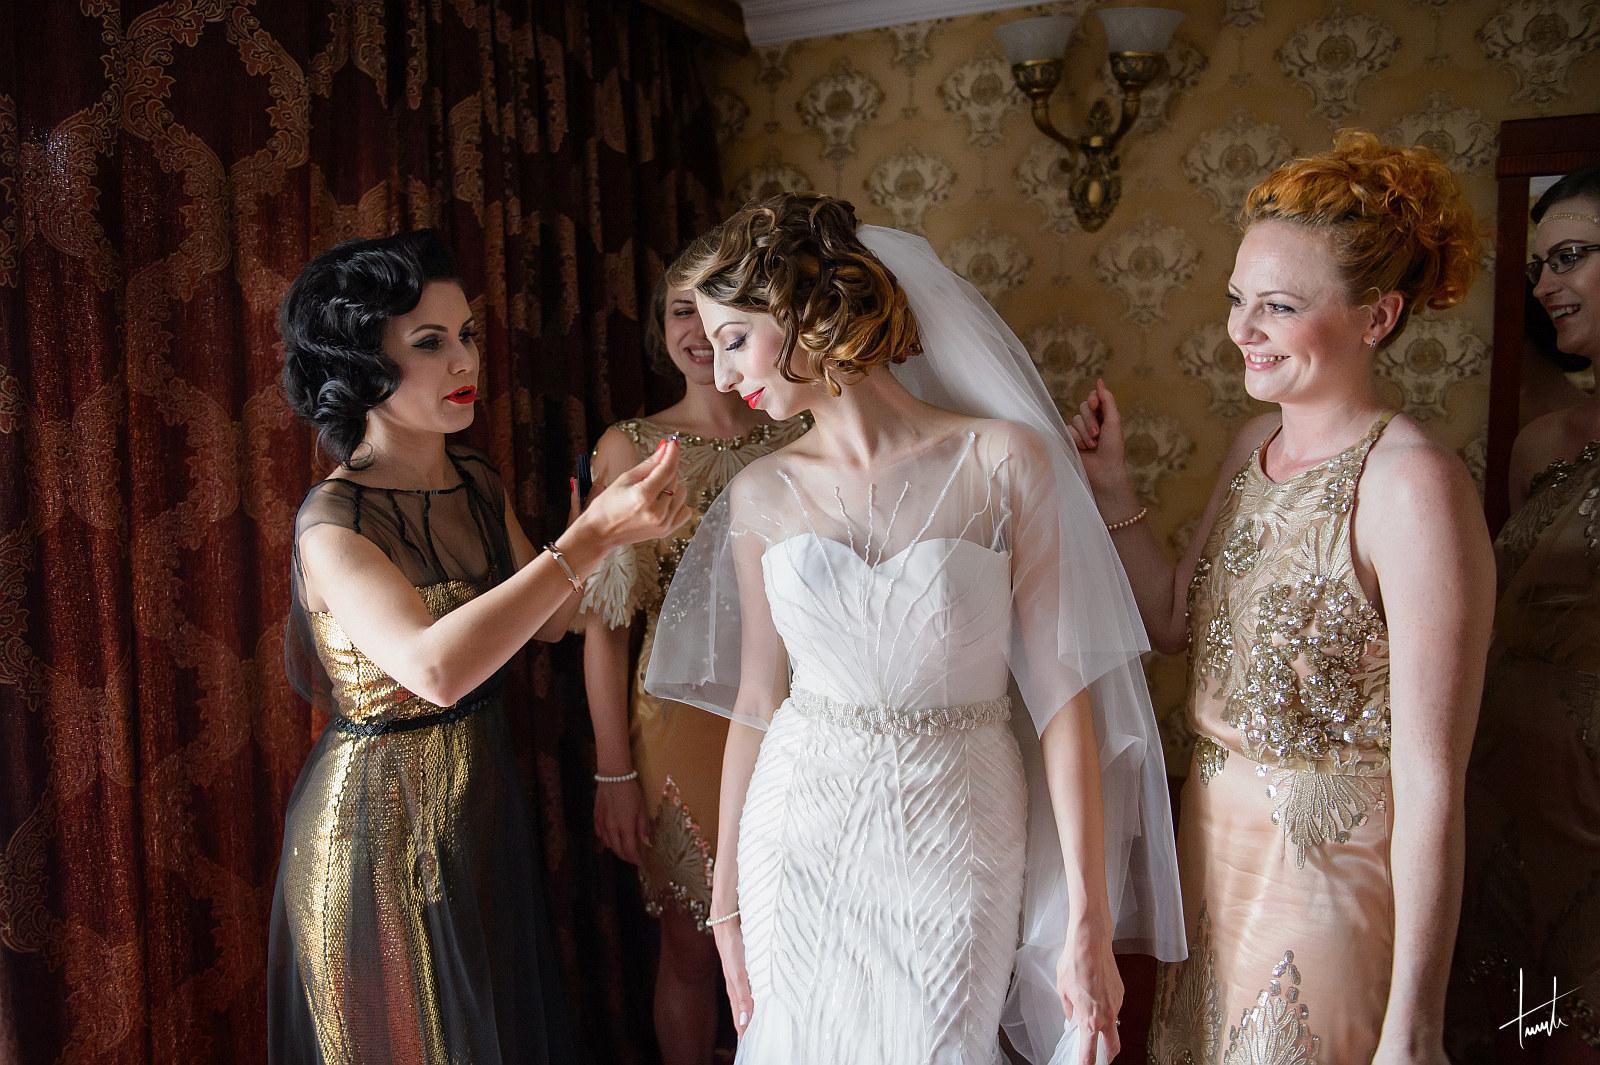 fotografie de nunta - Alina Mircea - by Bogdan Terente 09